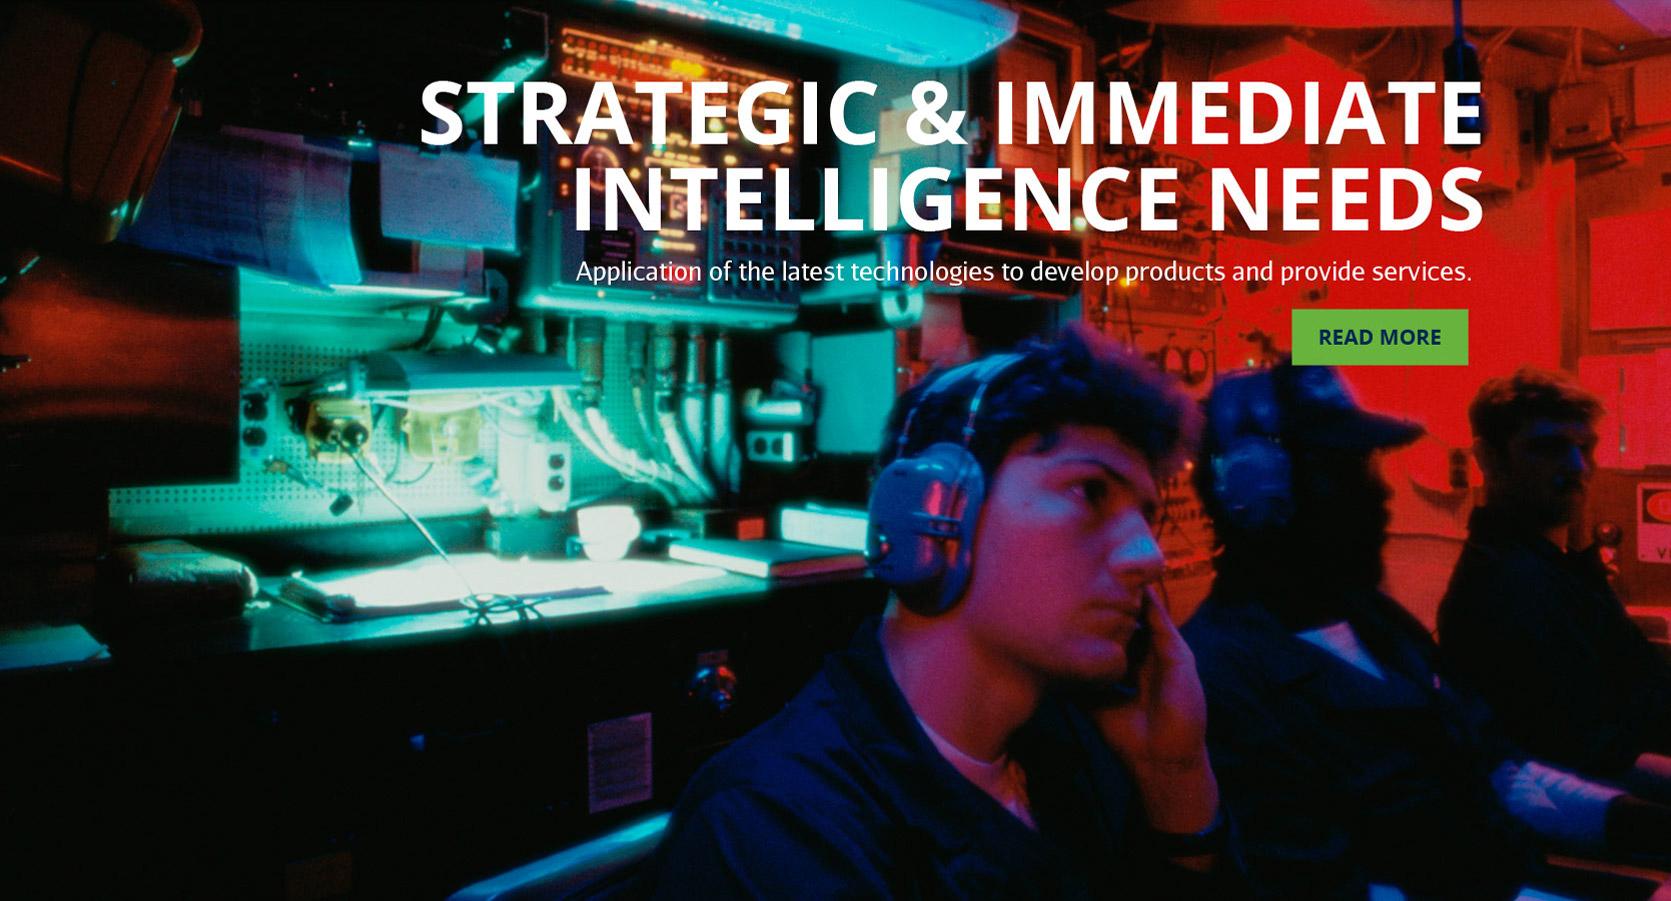 Strategic & Immediate Intelligence Needs